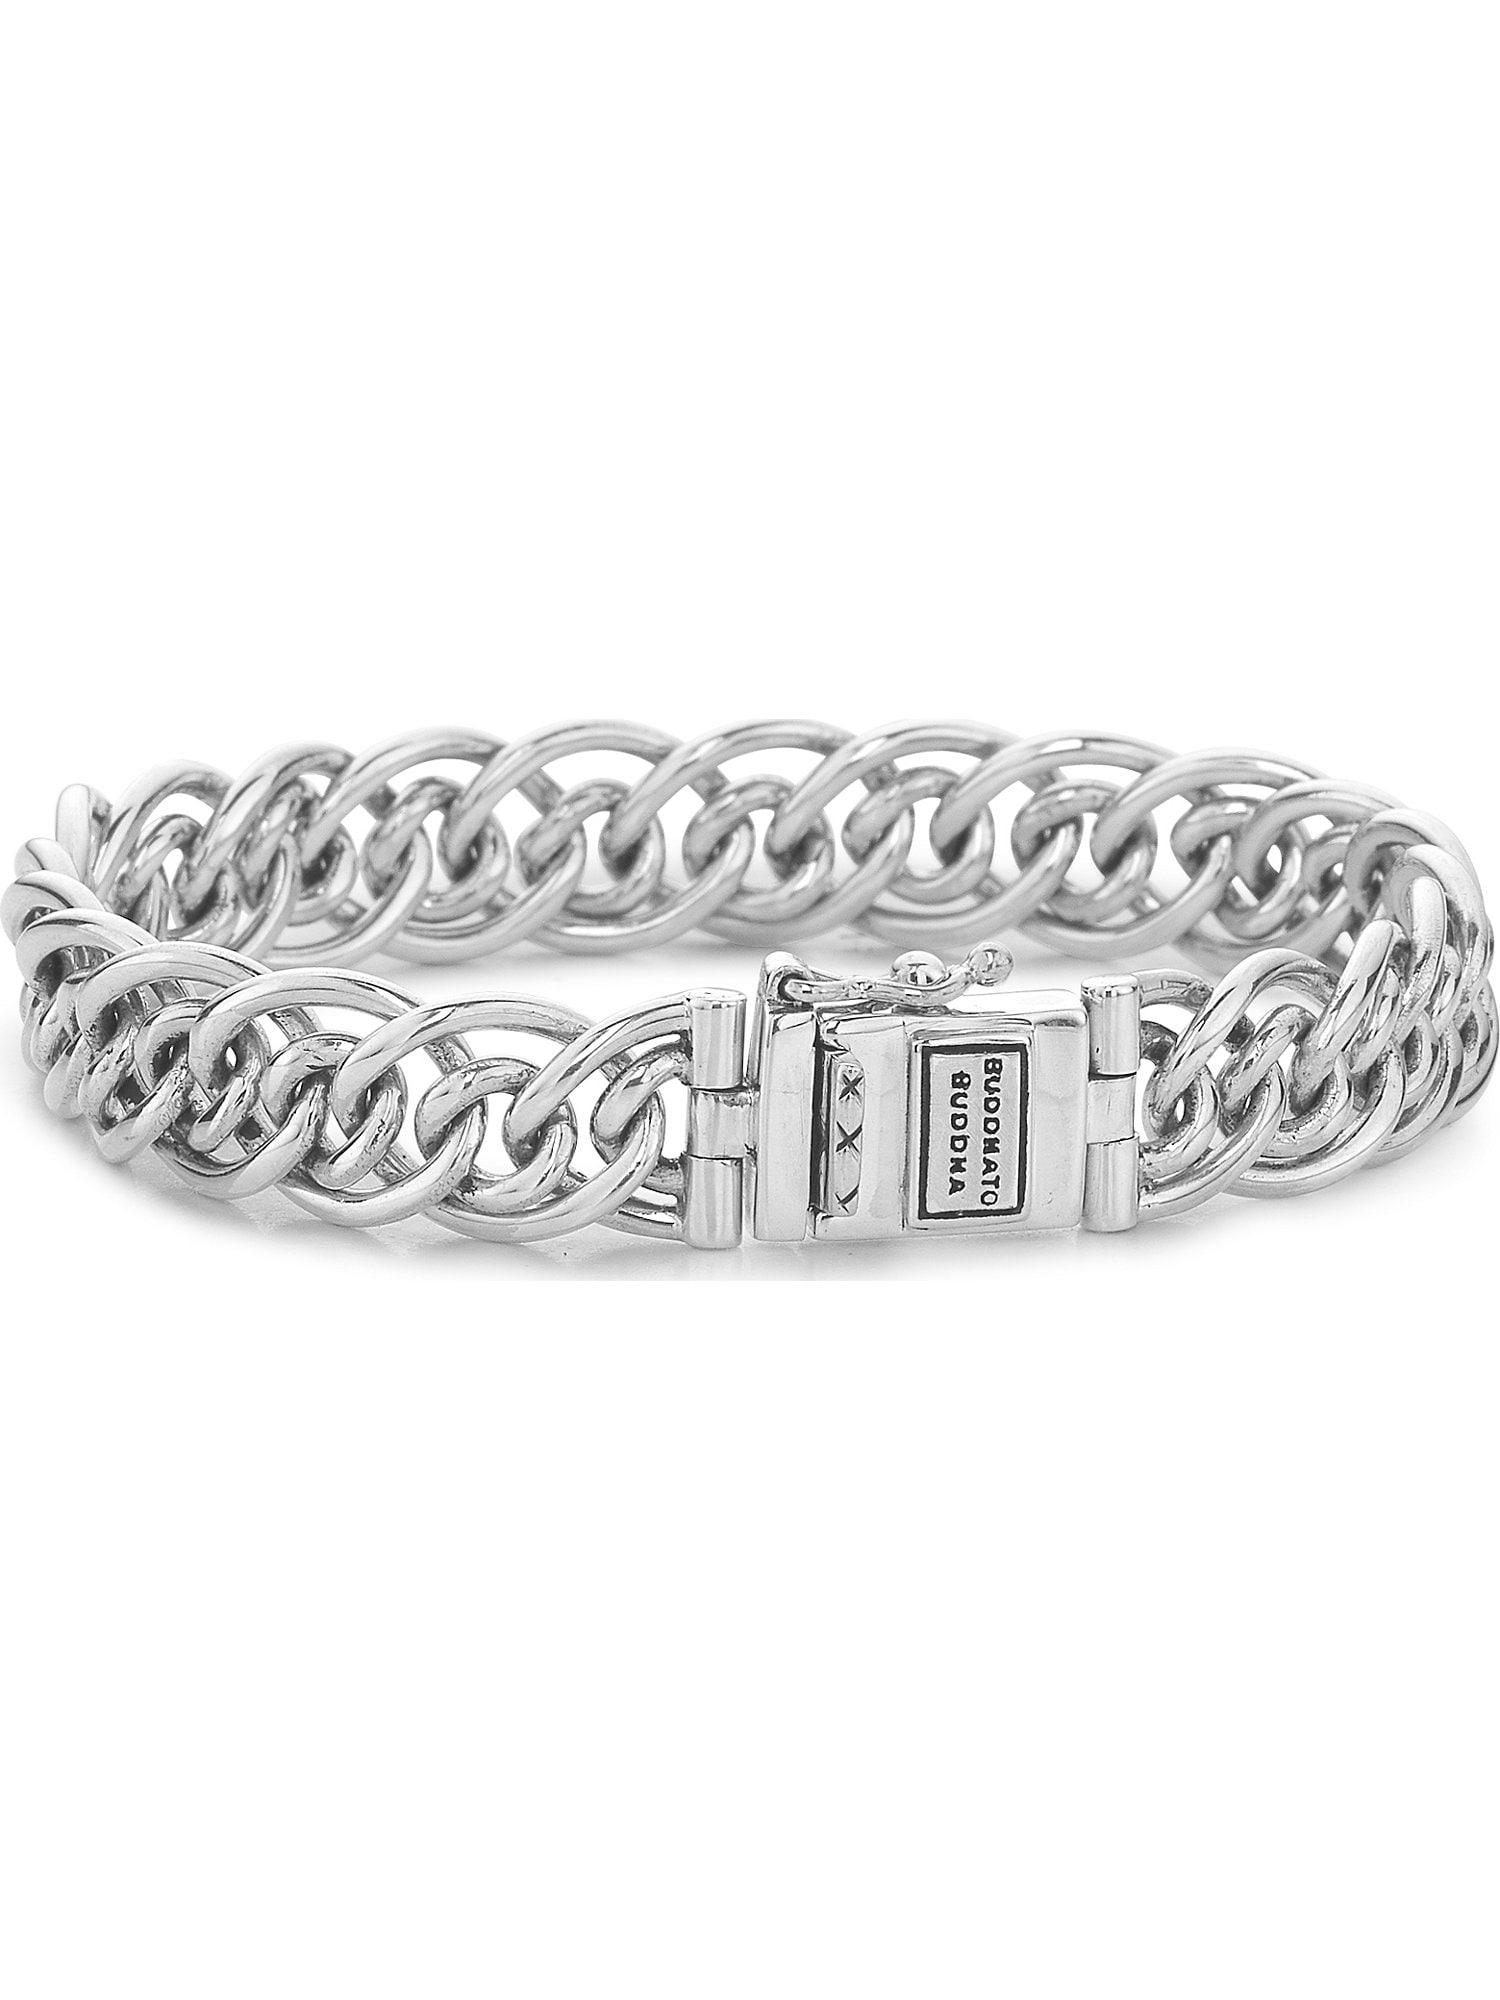 Armband 'Nathalie' | Schmuck > Armbänder > Sonstige Armbänder | Buddha To Buddha